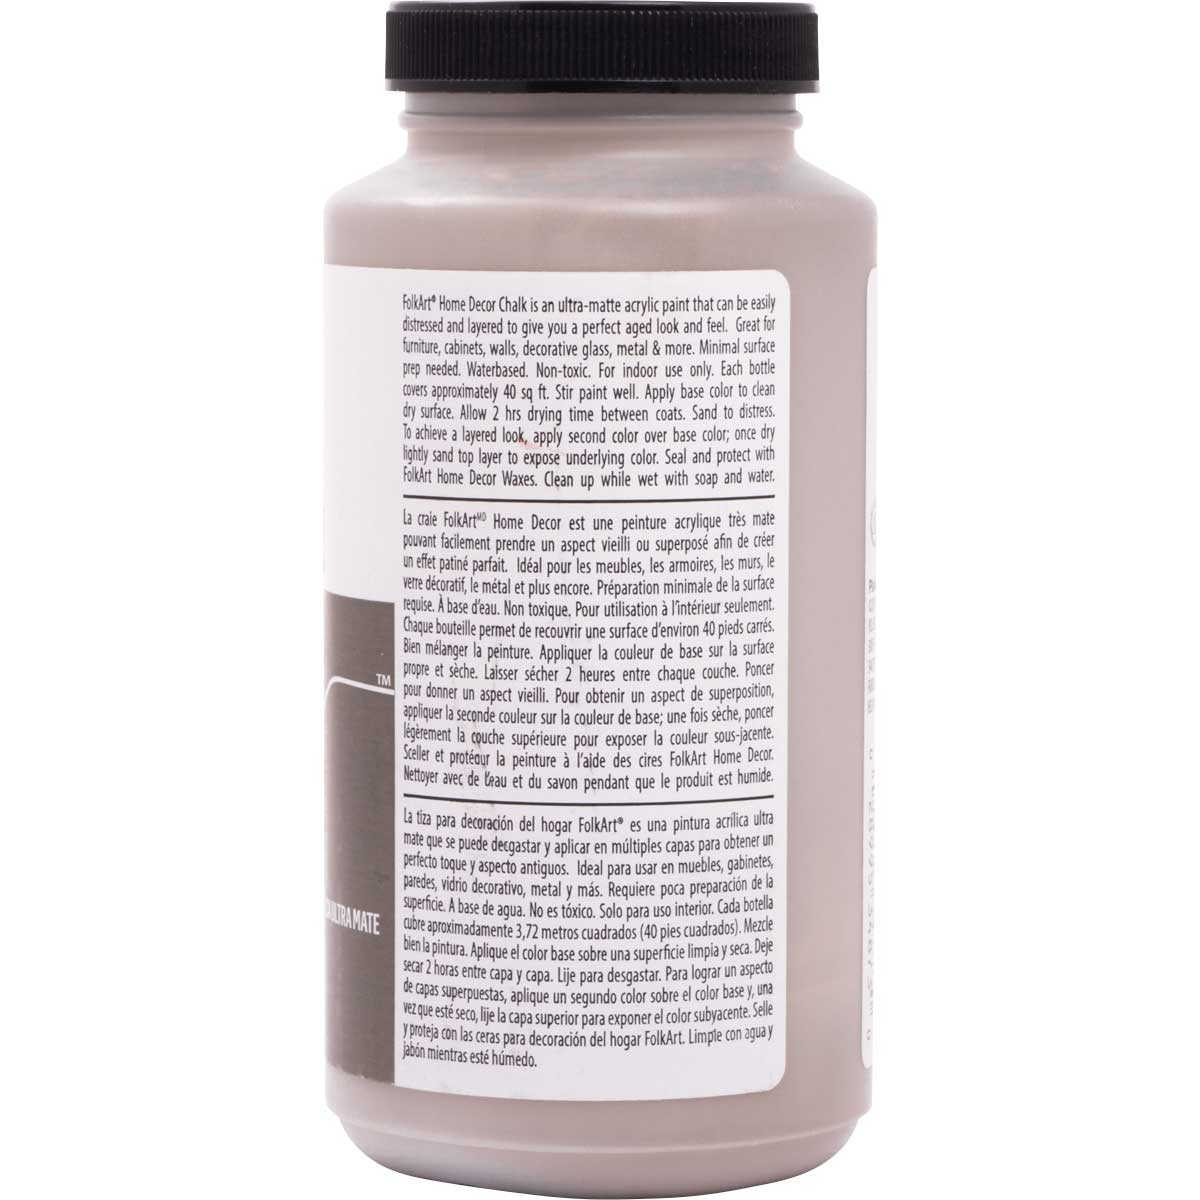 FolkArt ® Home Decor™ Chalk - Castle, 16 oz. - 34873